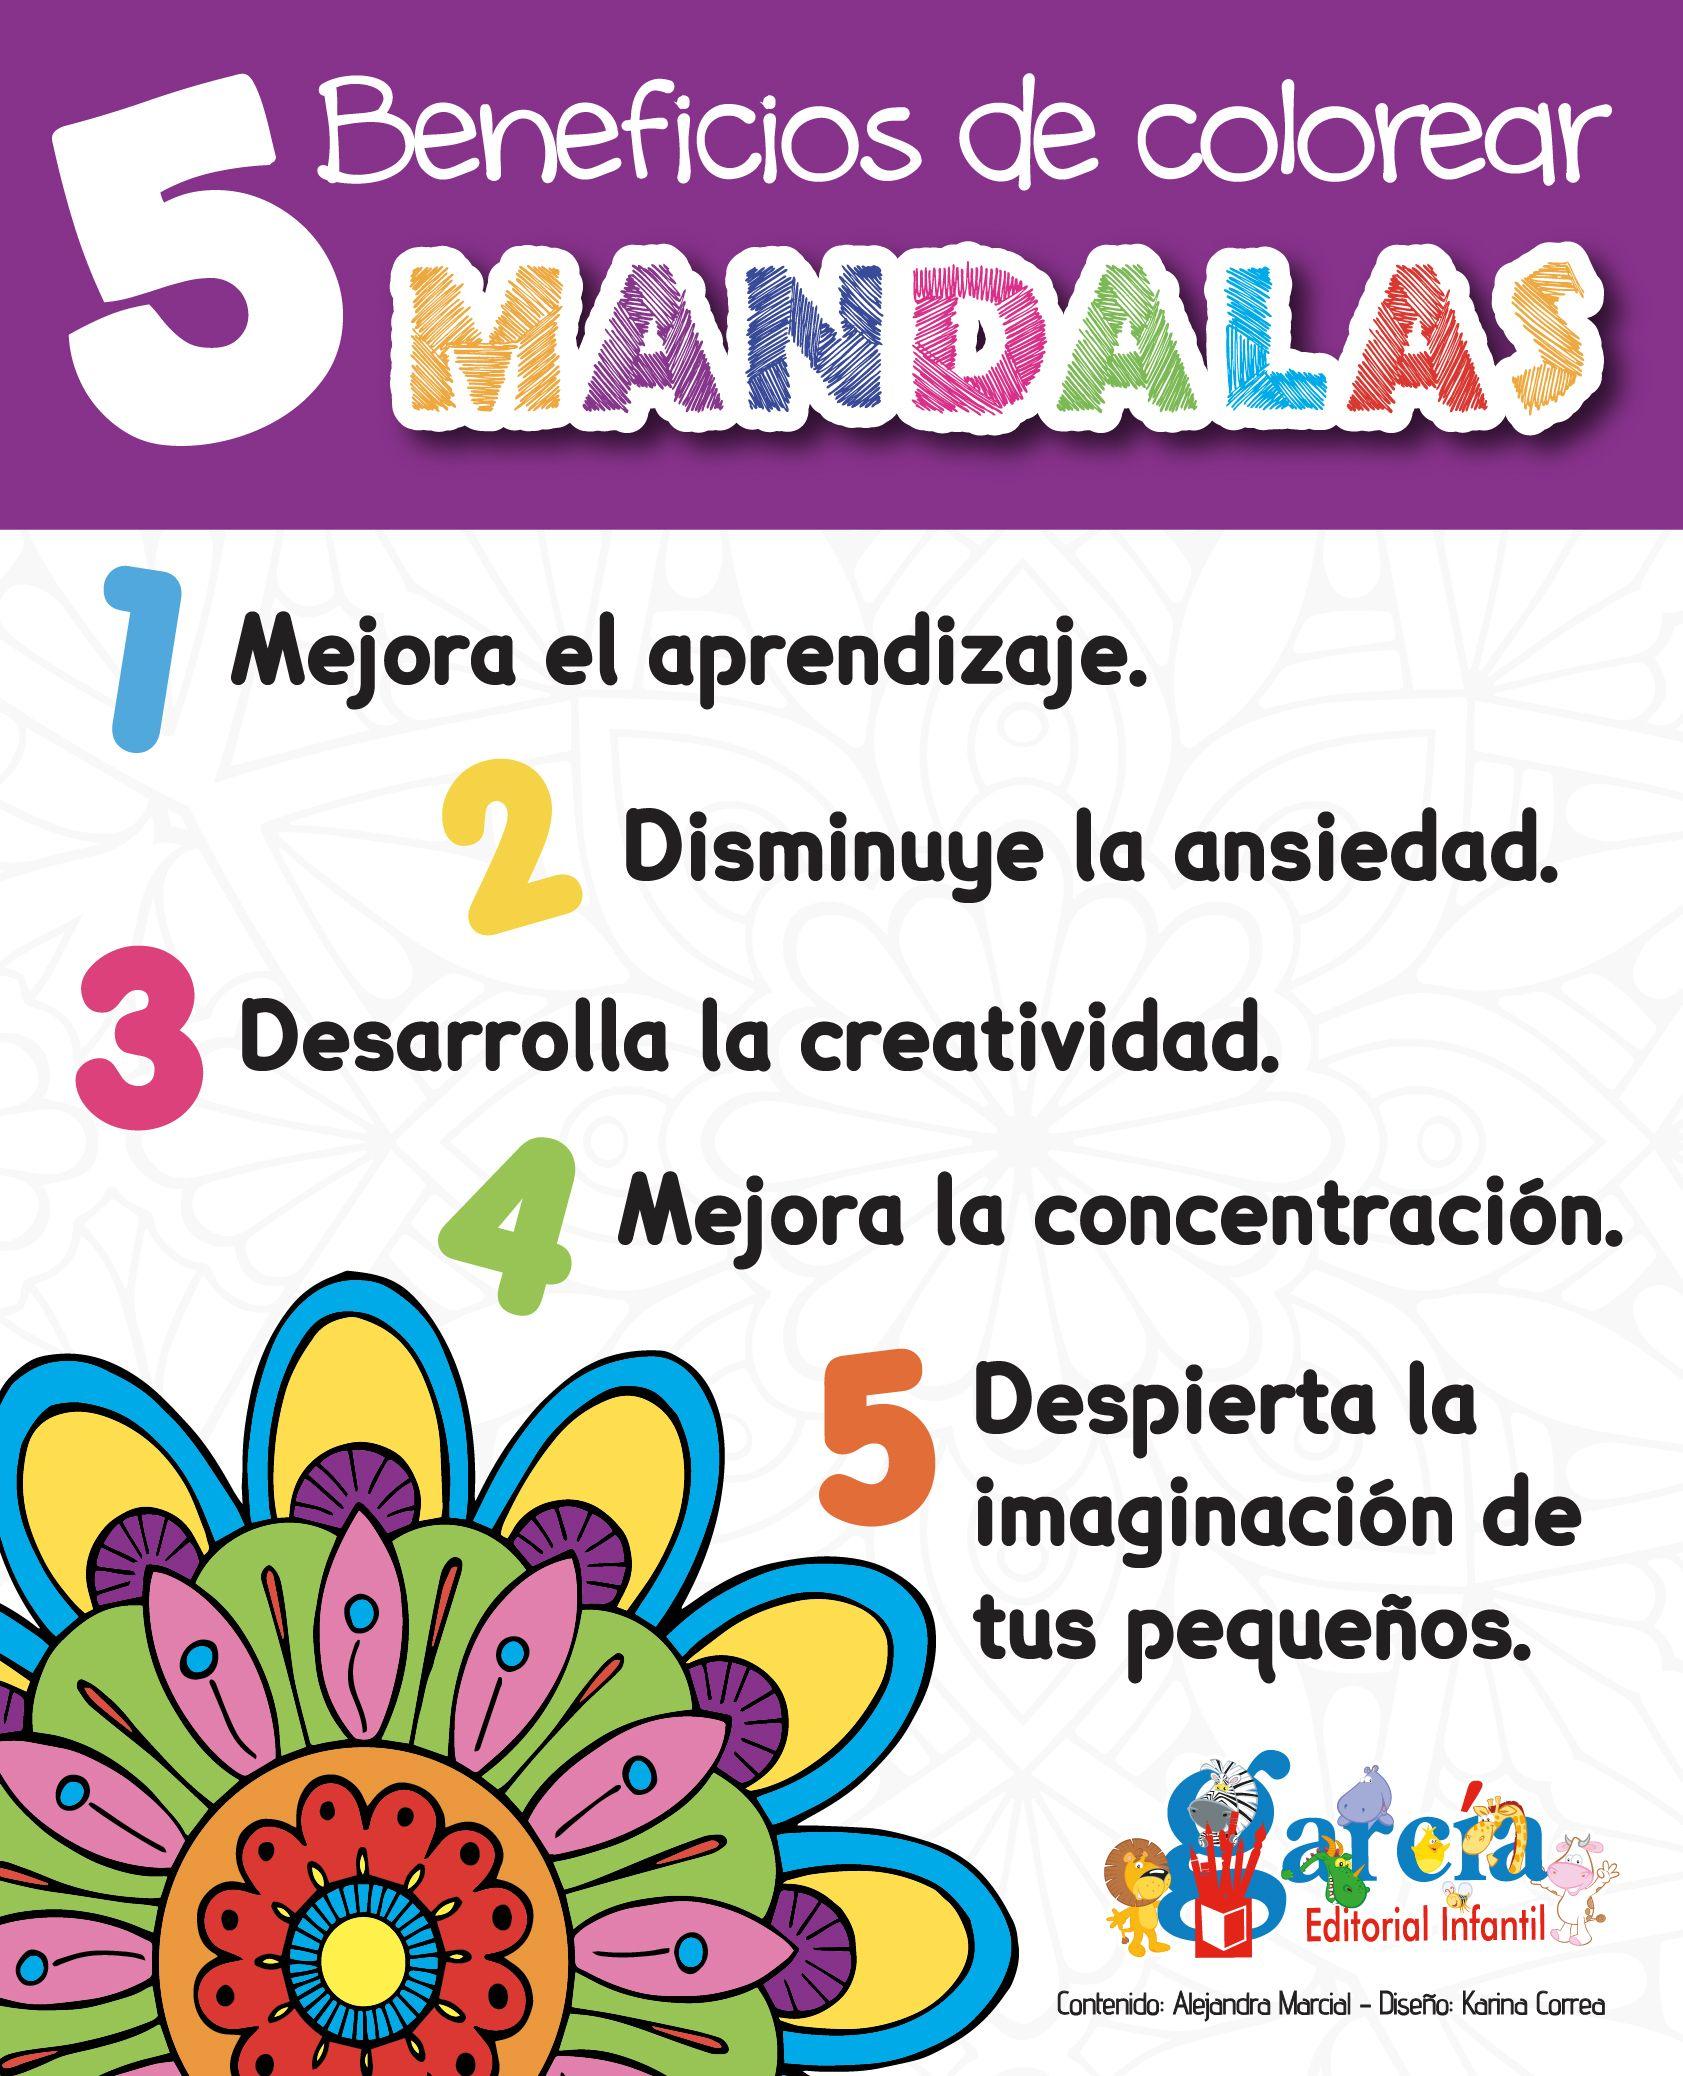 Mandalas La Actividad Perfecta Para Tus Peques Mamáskinder Misskinde Tecnicas De Enseñanza Aprendizaje Educacion Emocional Educacion Emocional Infantil